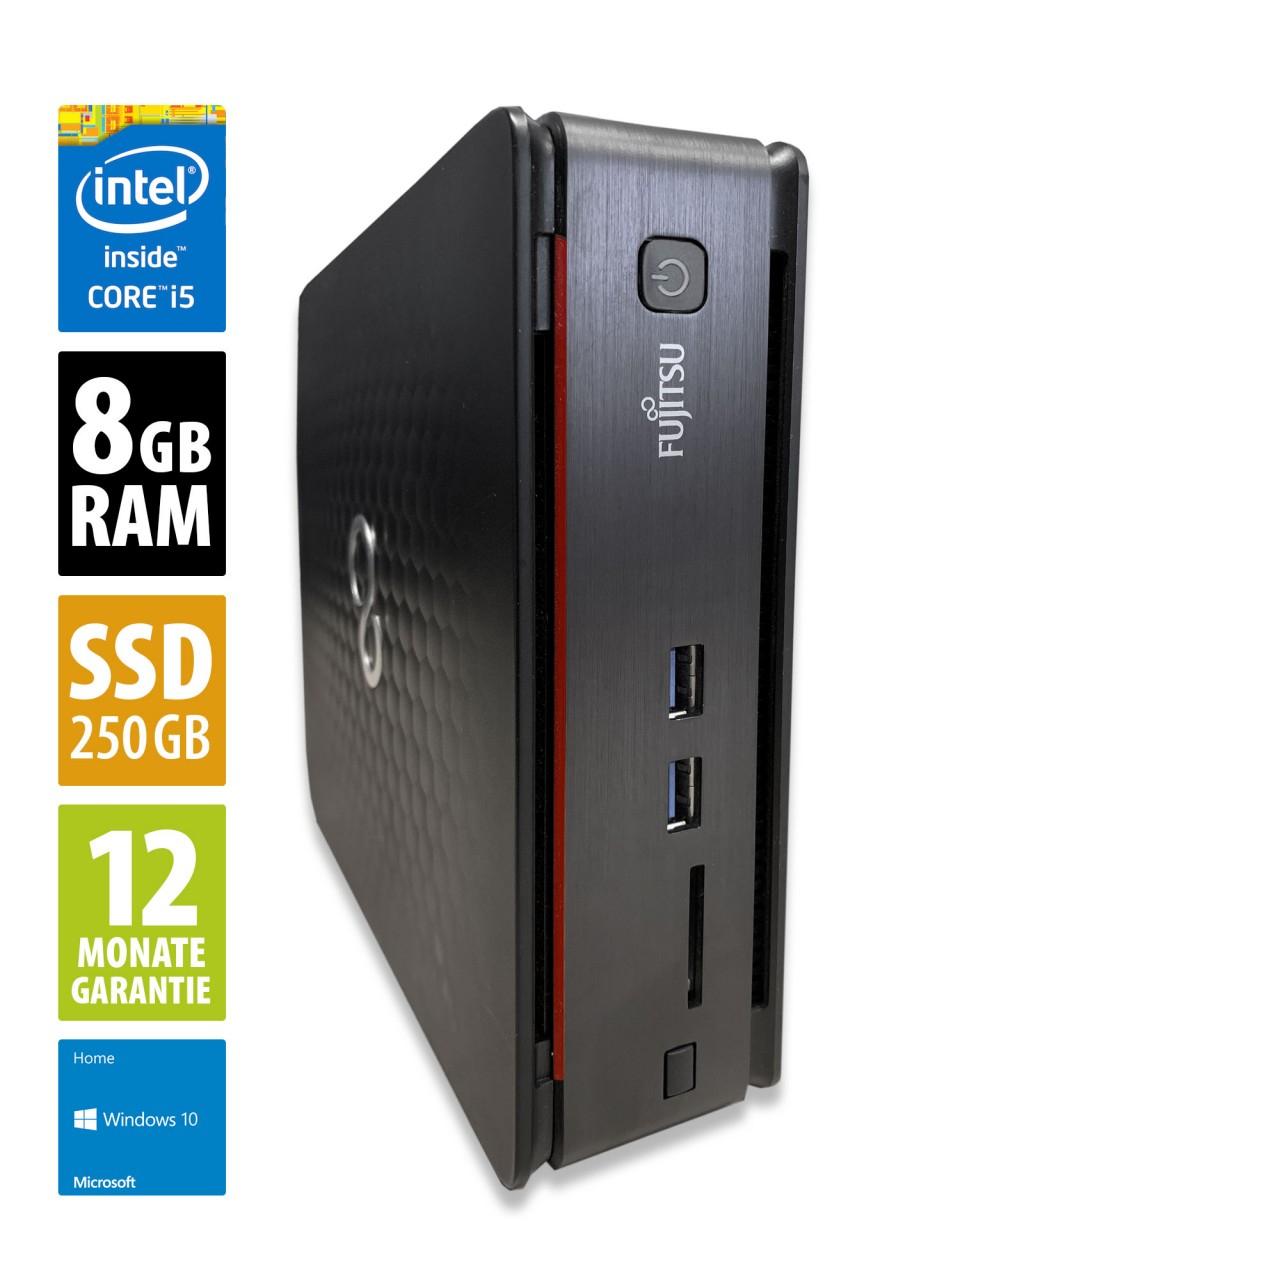 [Gebraucht] Fujitsu Esprimo Q920 Mini PC - Core i5-4590T @ 2,0 GHz - 8GB RAM - 250GB SSD - Win10Home [AfBShop]